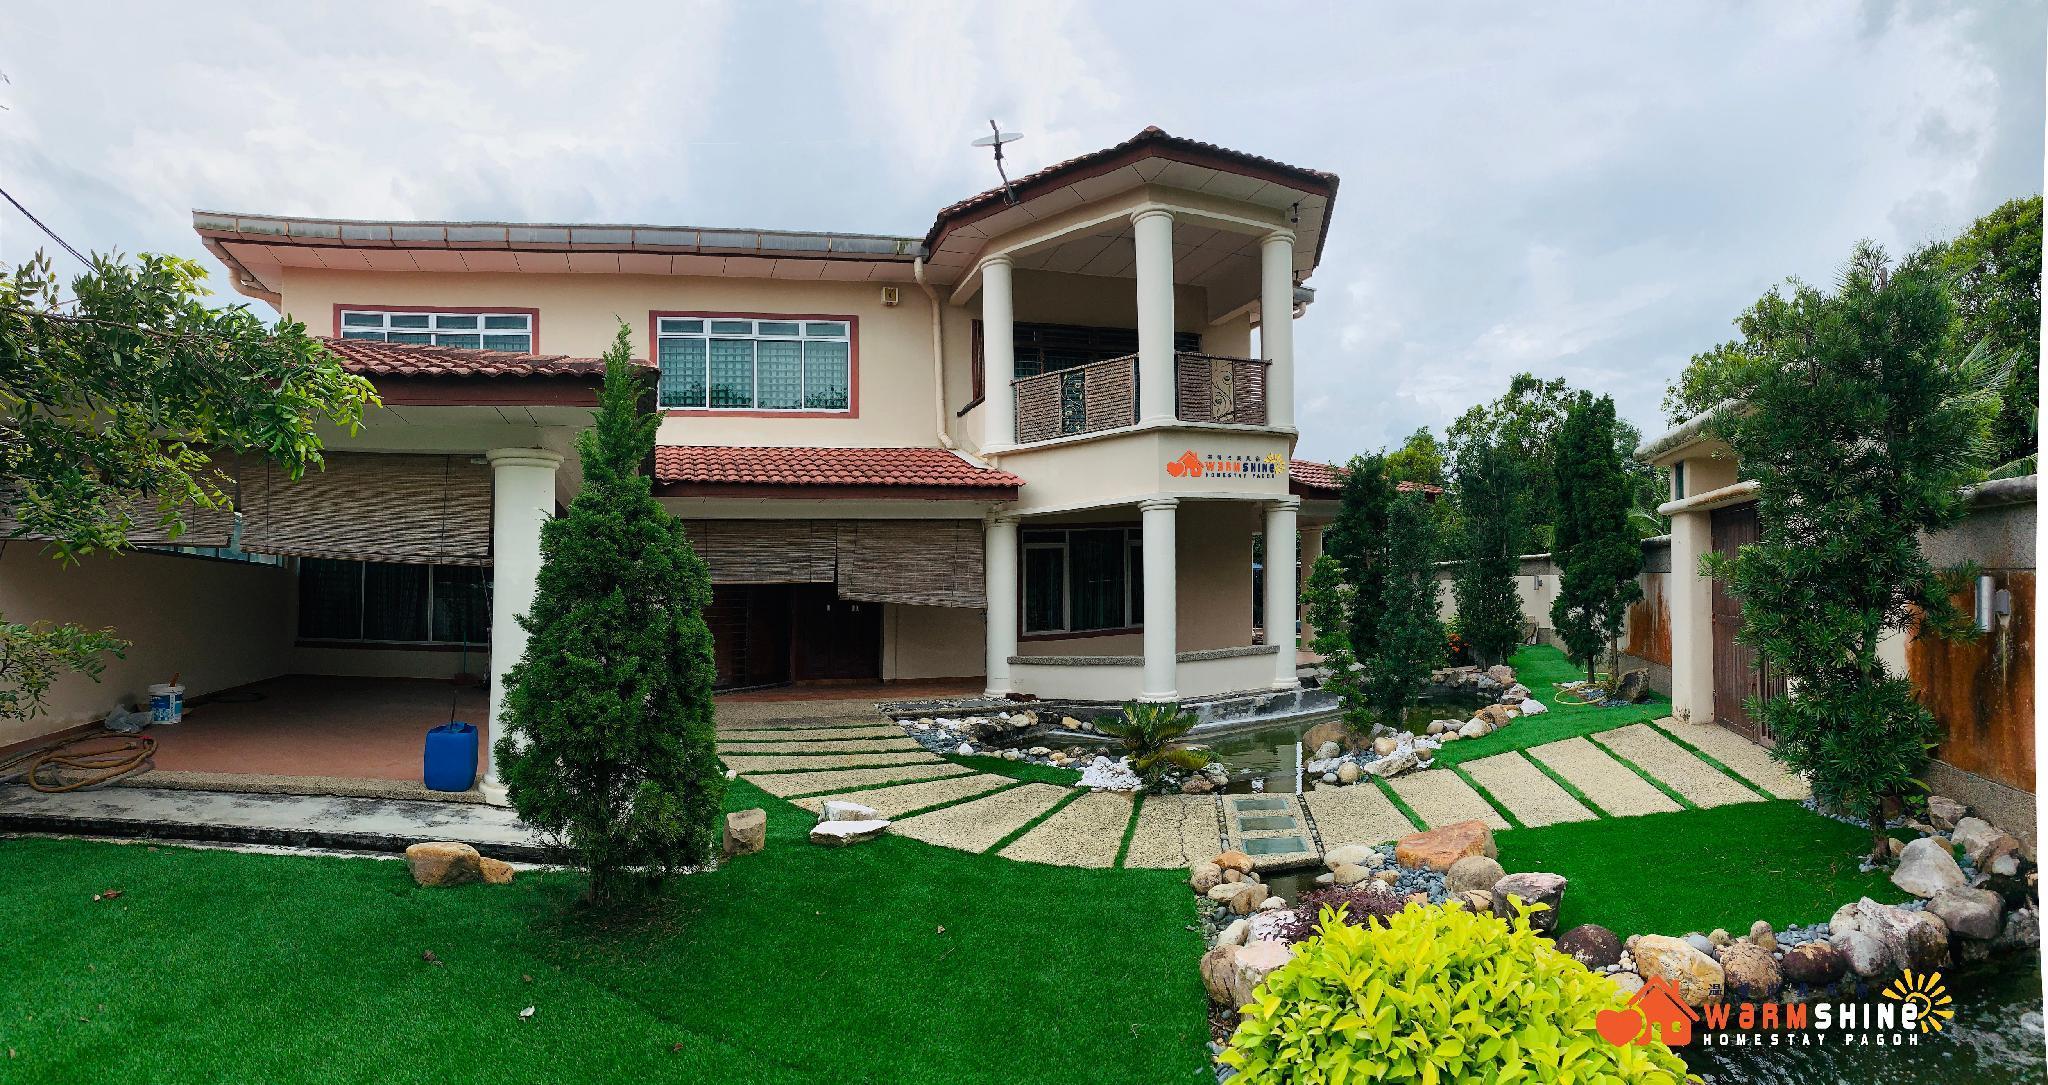 Warmshine Pagoh HomeStay  16 Pax